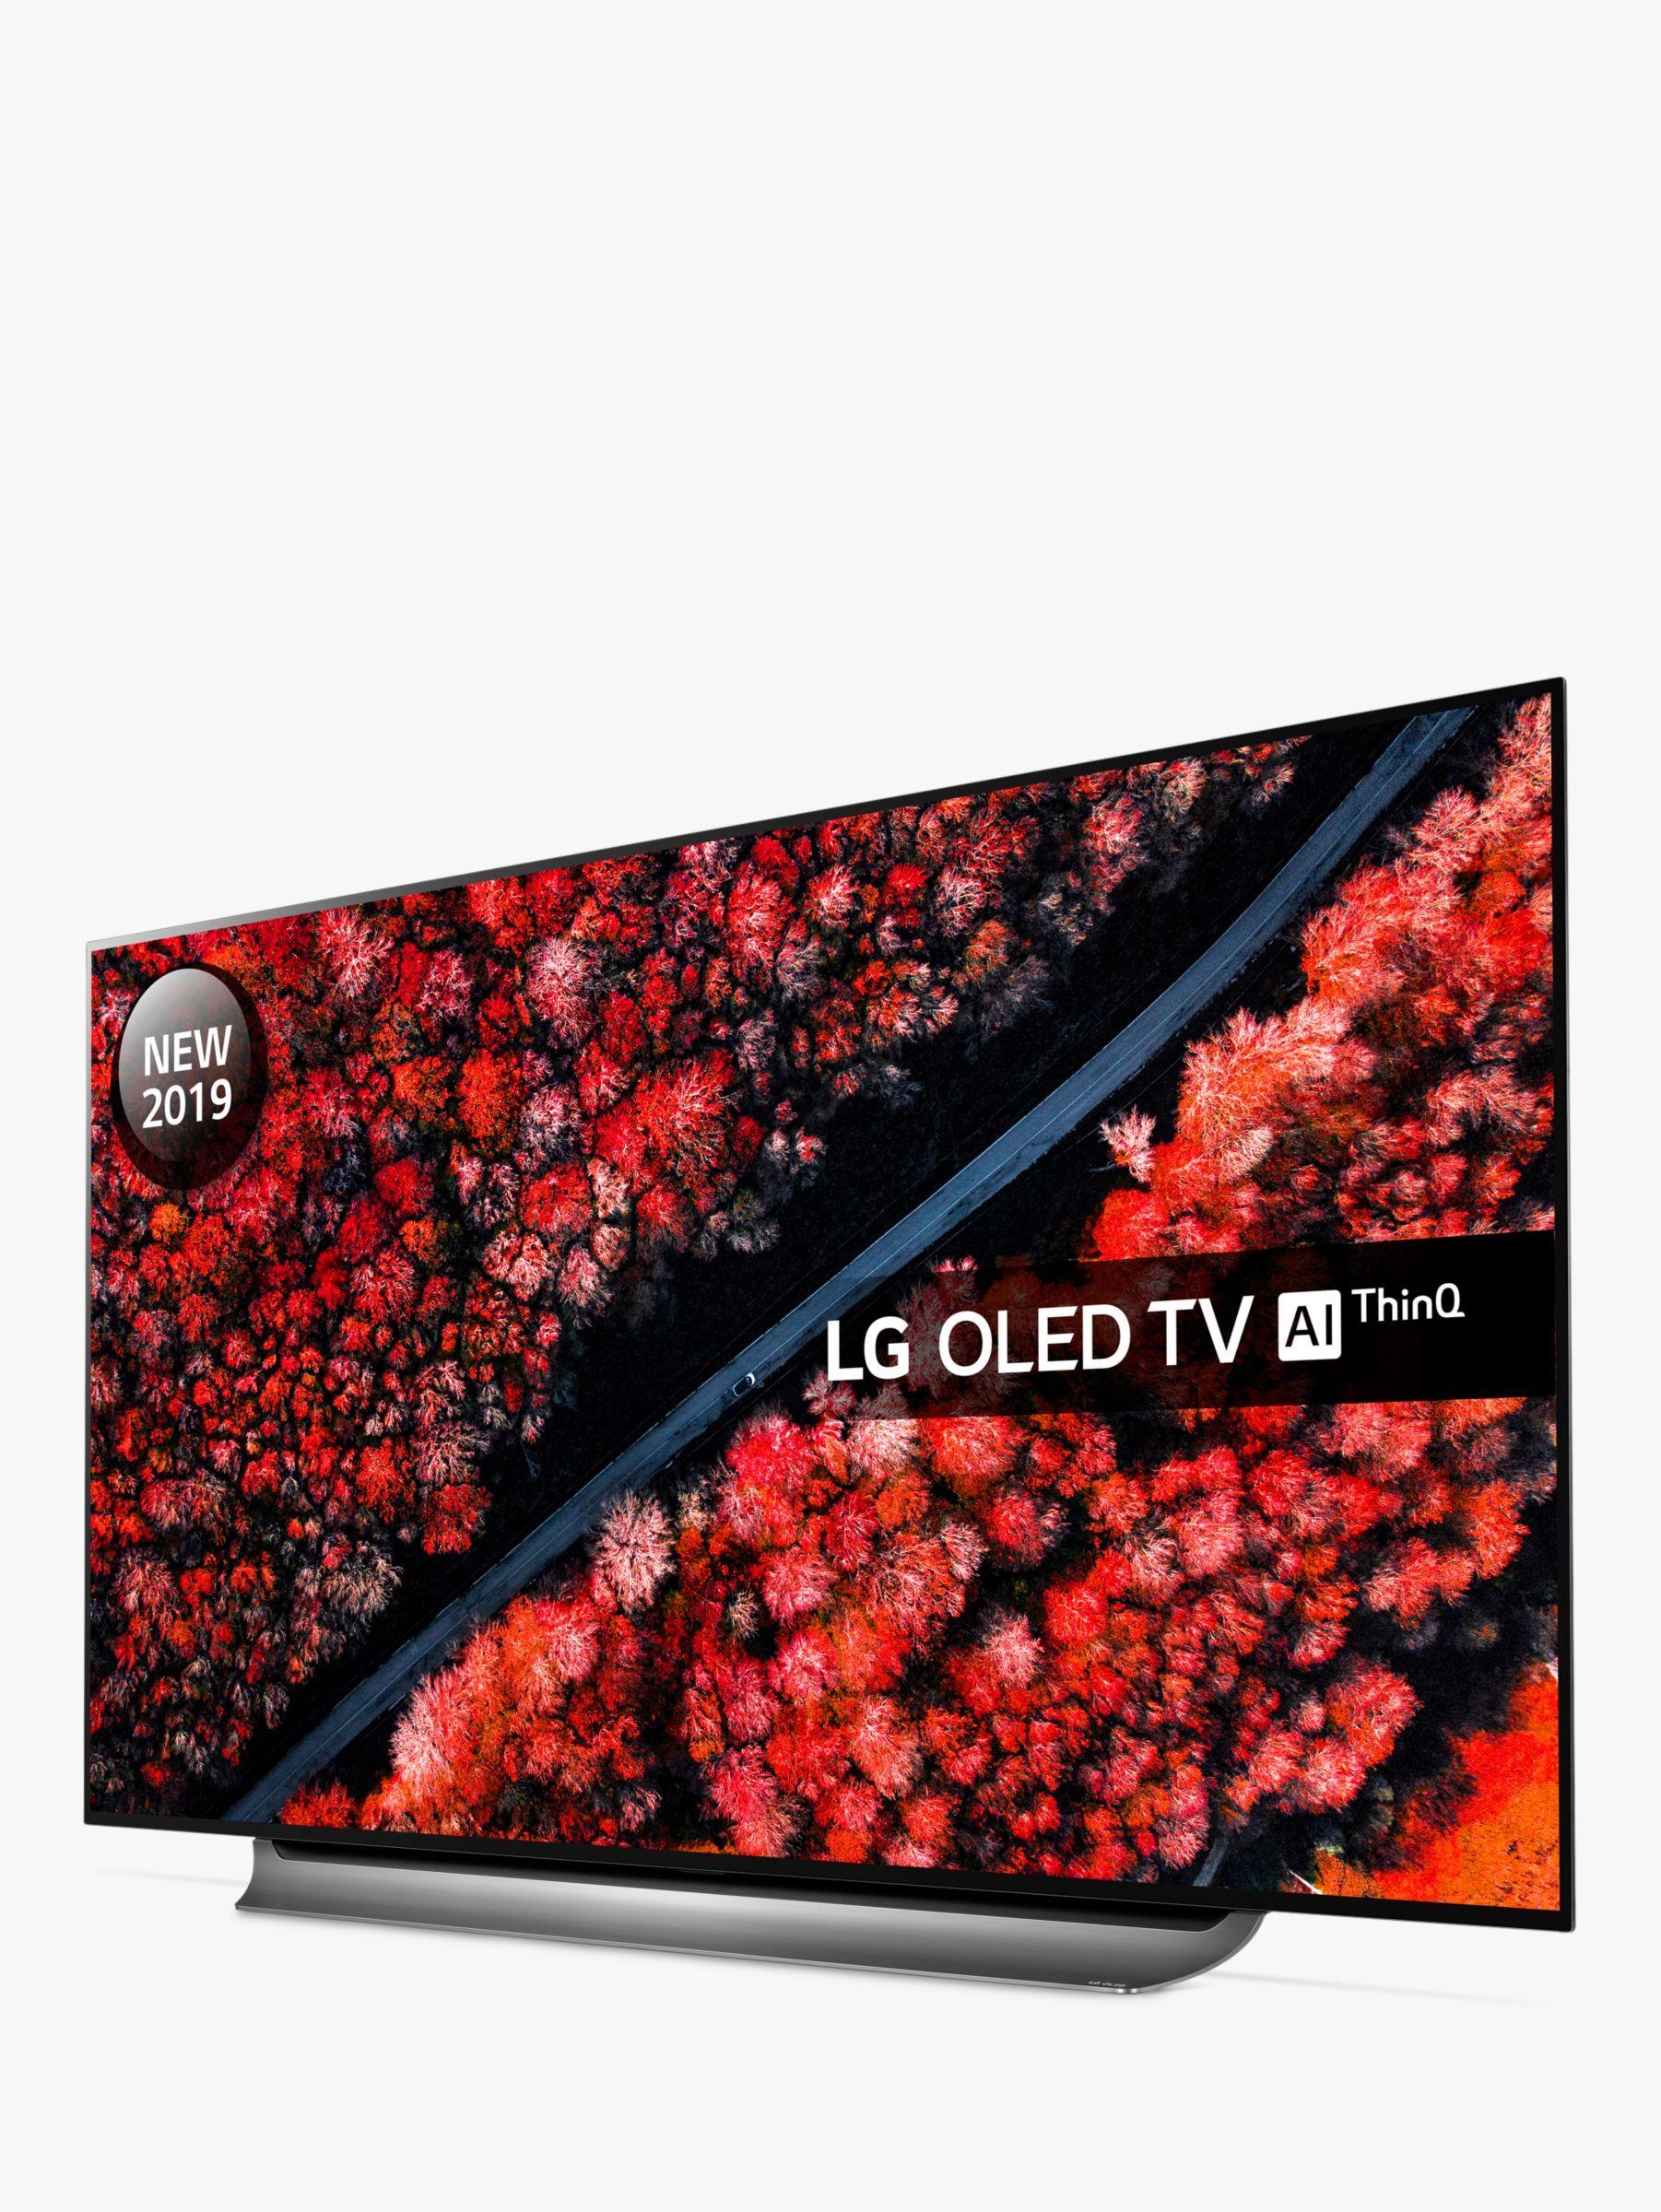 Lg Oled77c9pla 2019 Oled Hdr 4k Ultra Hd Smart Tv 77 With